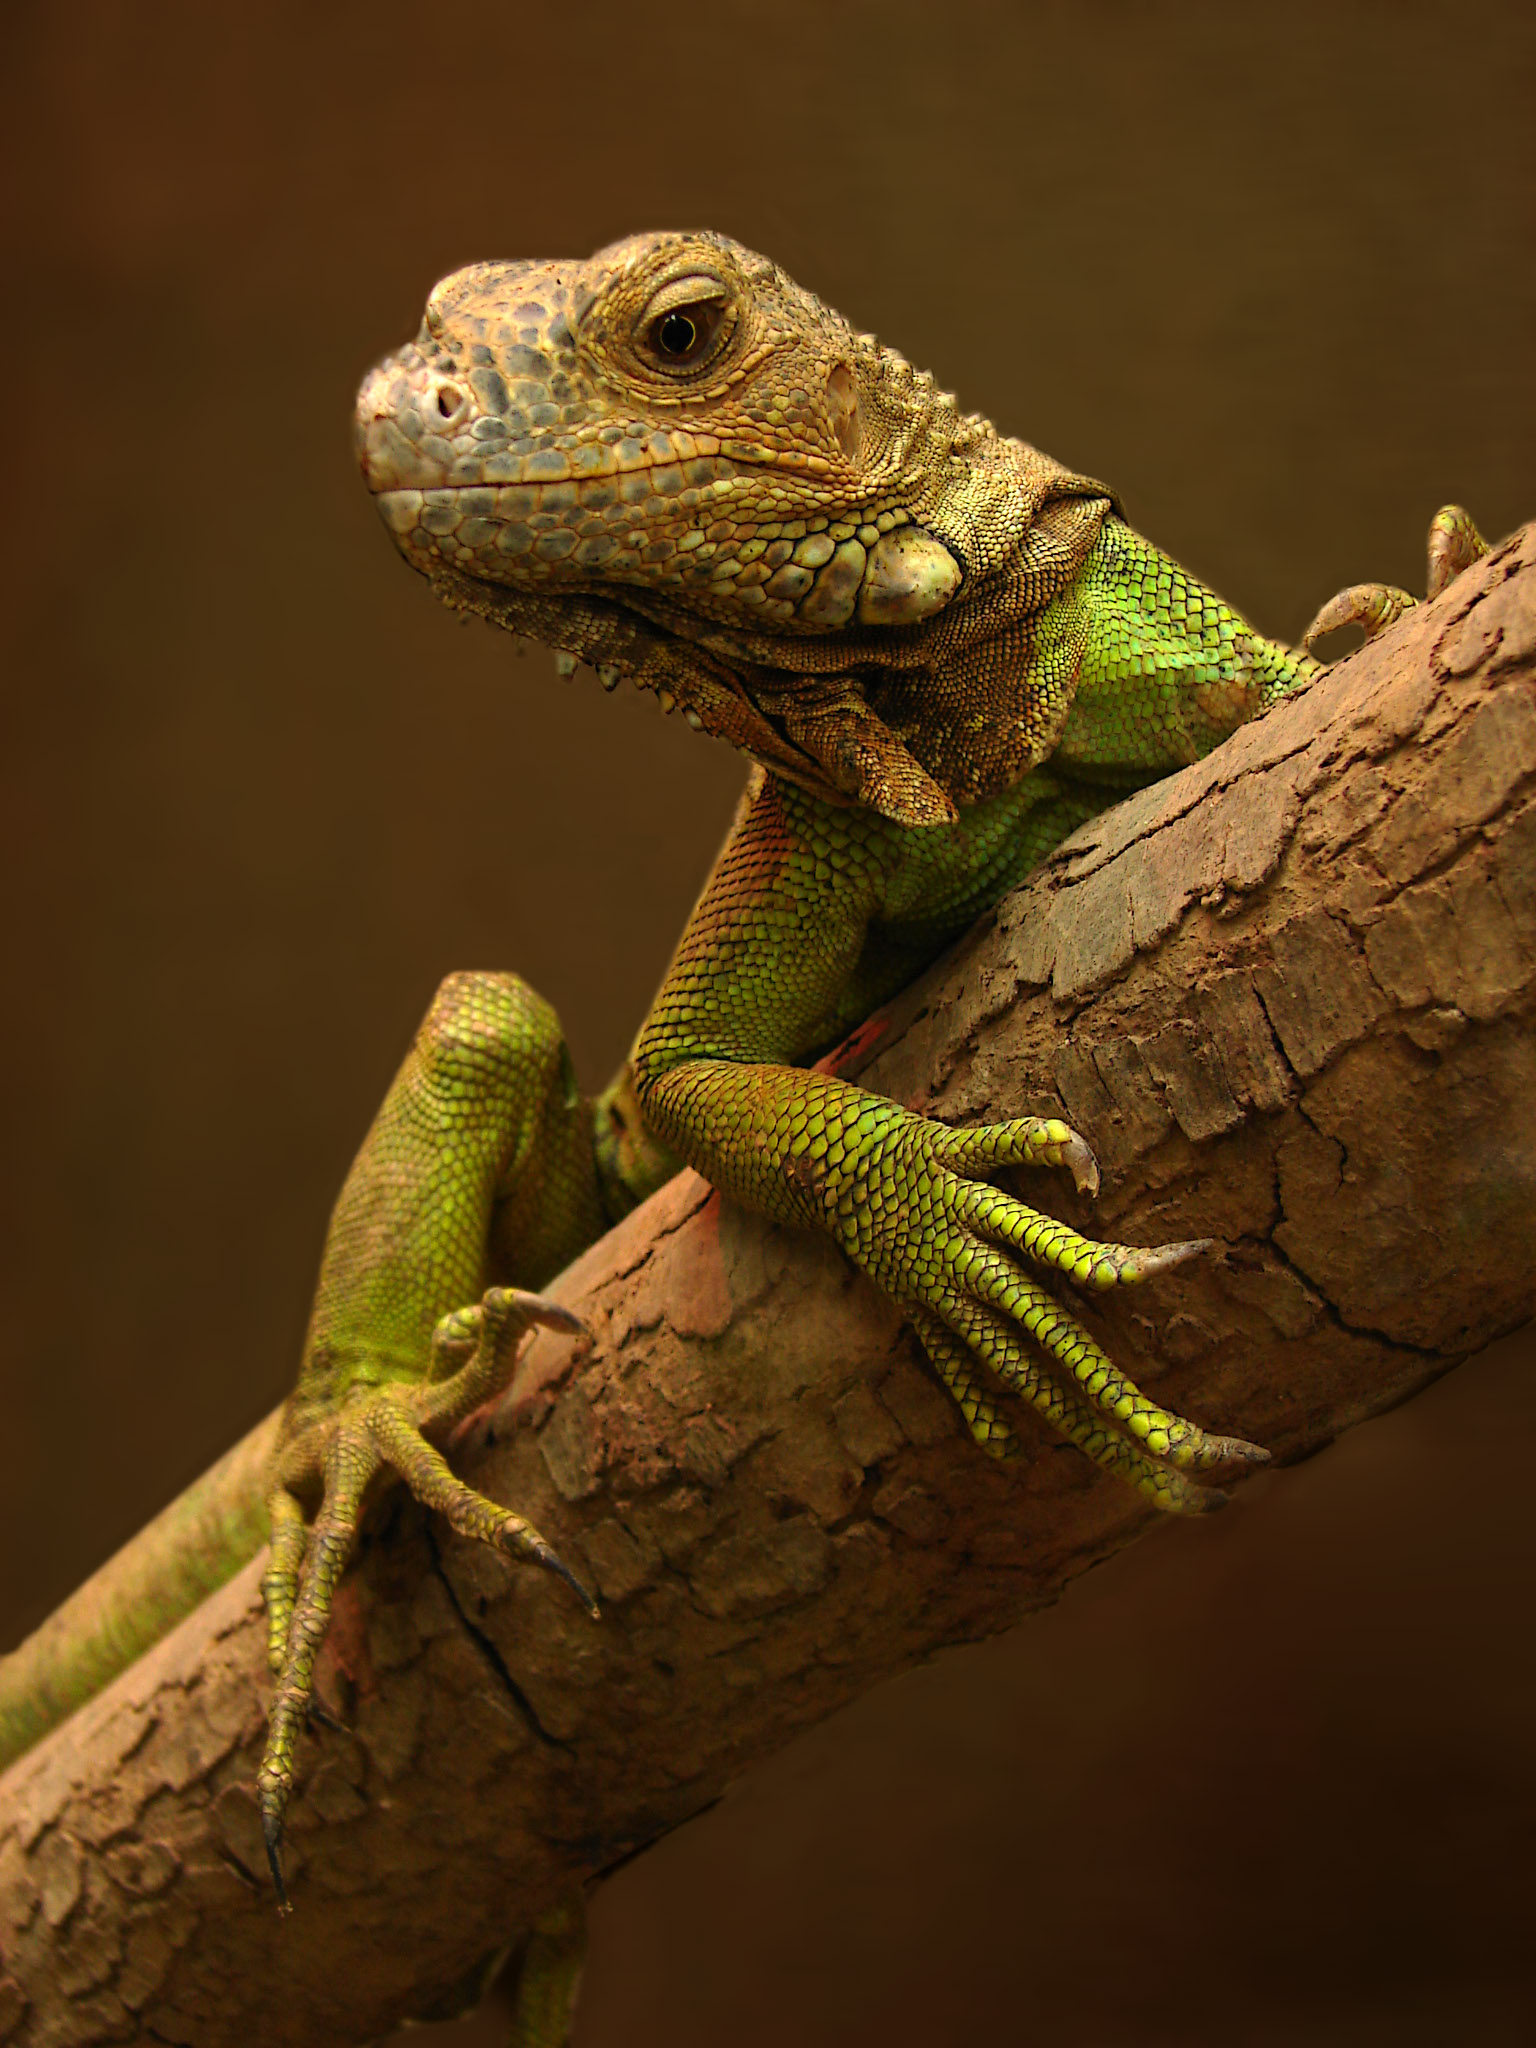 http://upload.wikimedia.org/wikipedia/commons/8/8e/Iguana_01102.jpg